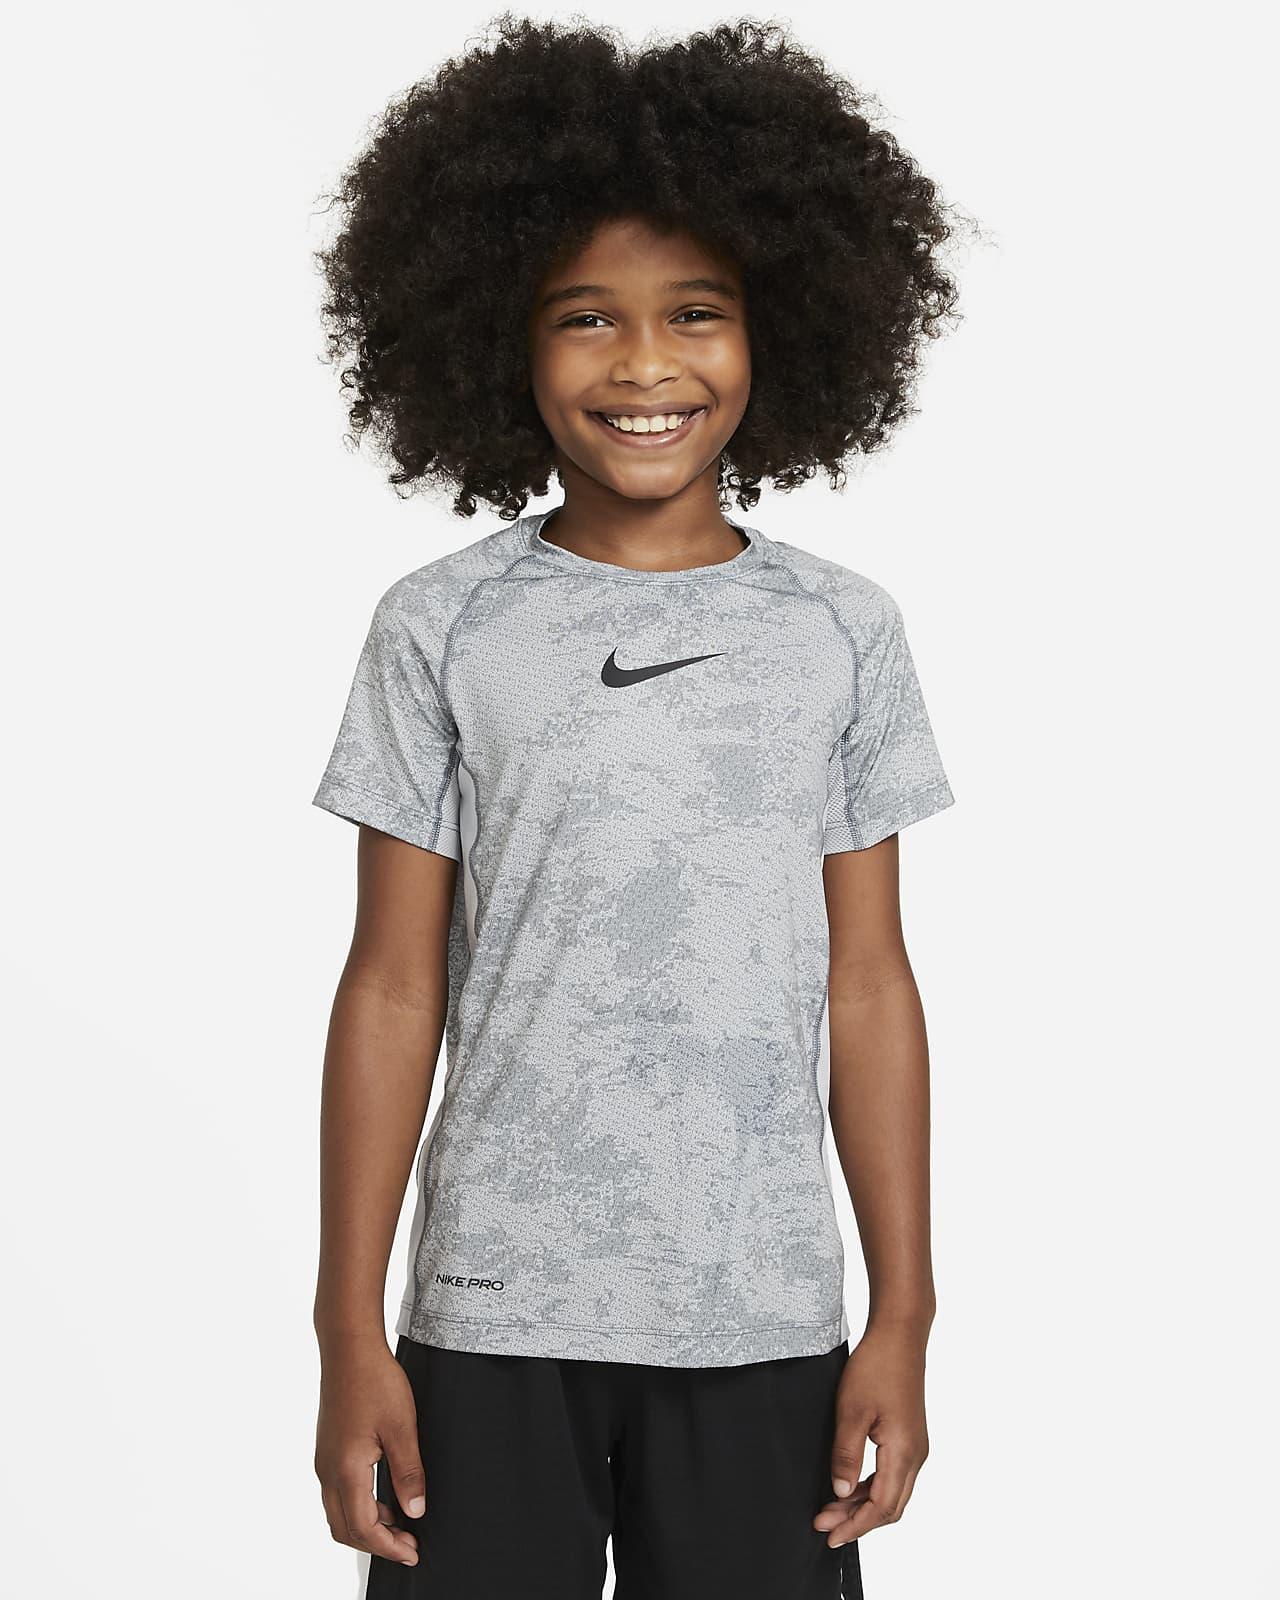 Nike Pro Big Kids' (Boys') Printed Training Top